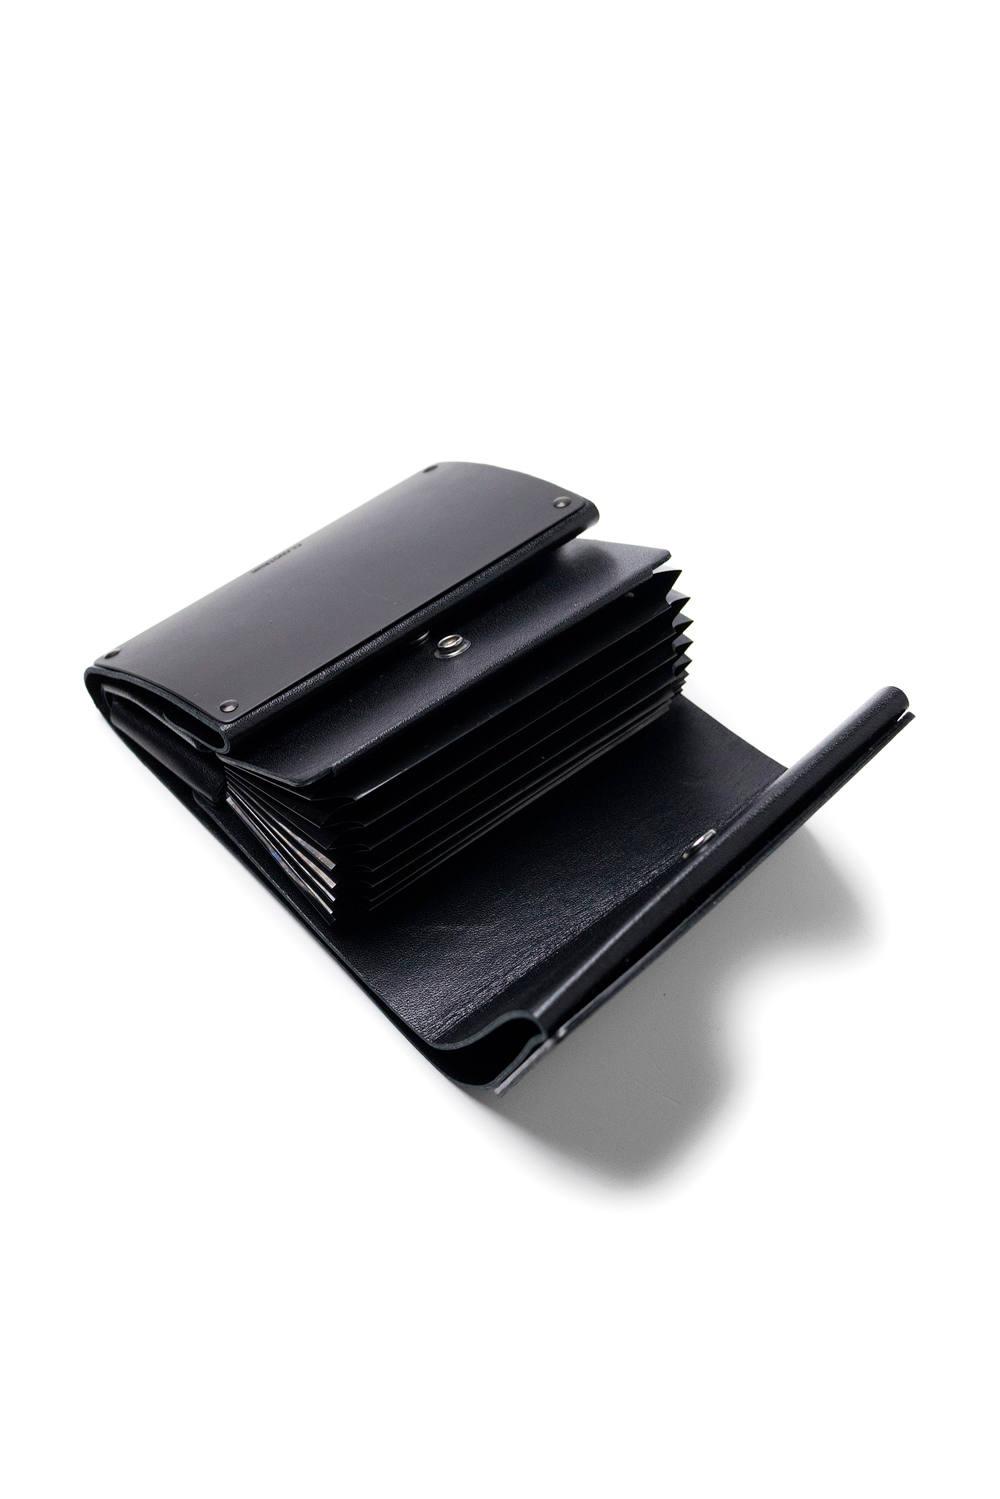 ARTICULAR WALLET [BLACK MATTE] / アーティキュラーウォレット [ブラックマット] | 二つ折り財布